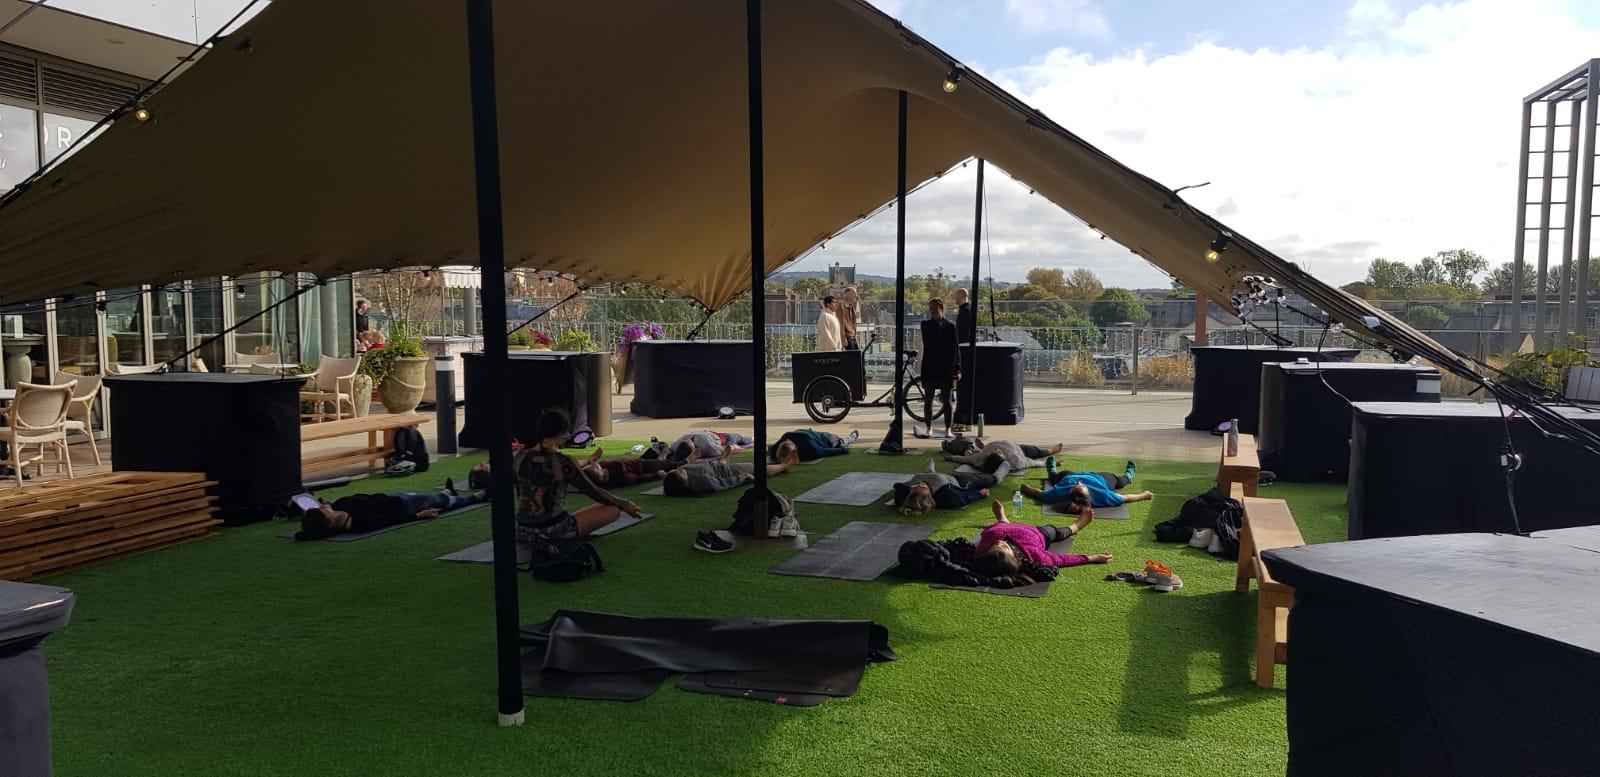 Yoga rooftop tent